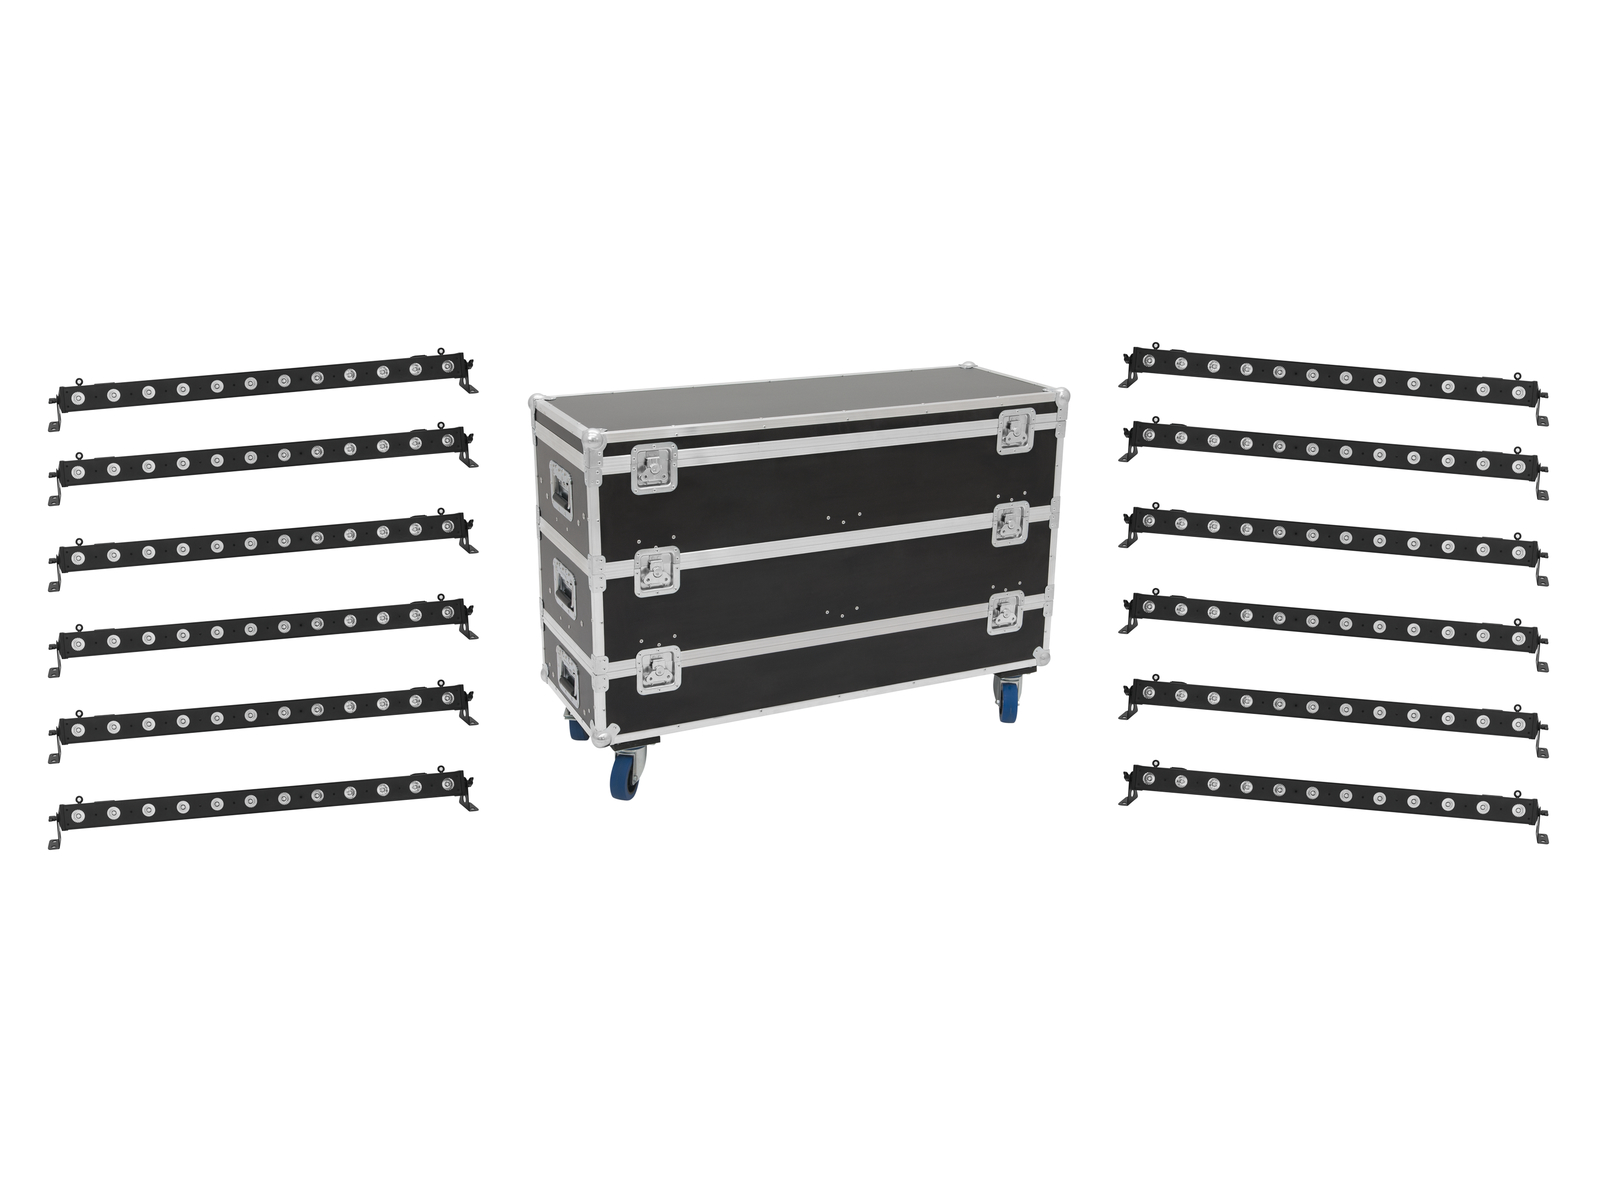 eurolite-set-12x-led-bar-12-qcl-rgbw-leiste-case-l